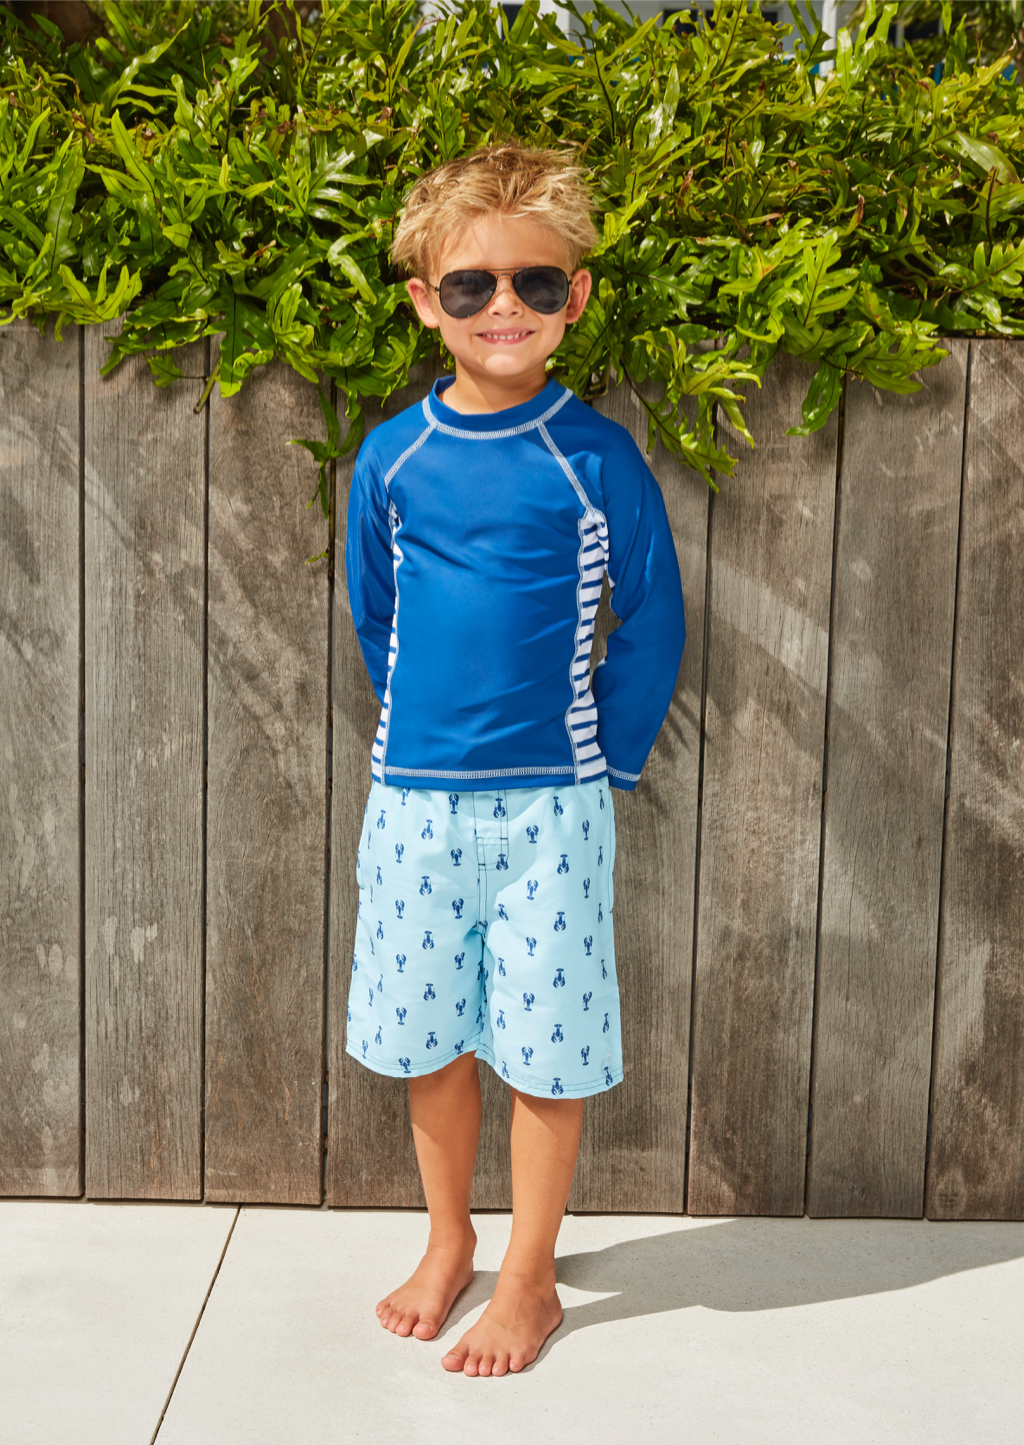 Little-Boys-Rashguard-Sets_Cabana-Life_Blue-Lobsters-Rashguard-Set-1.jpg